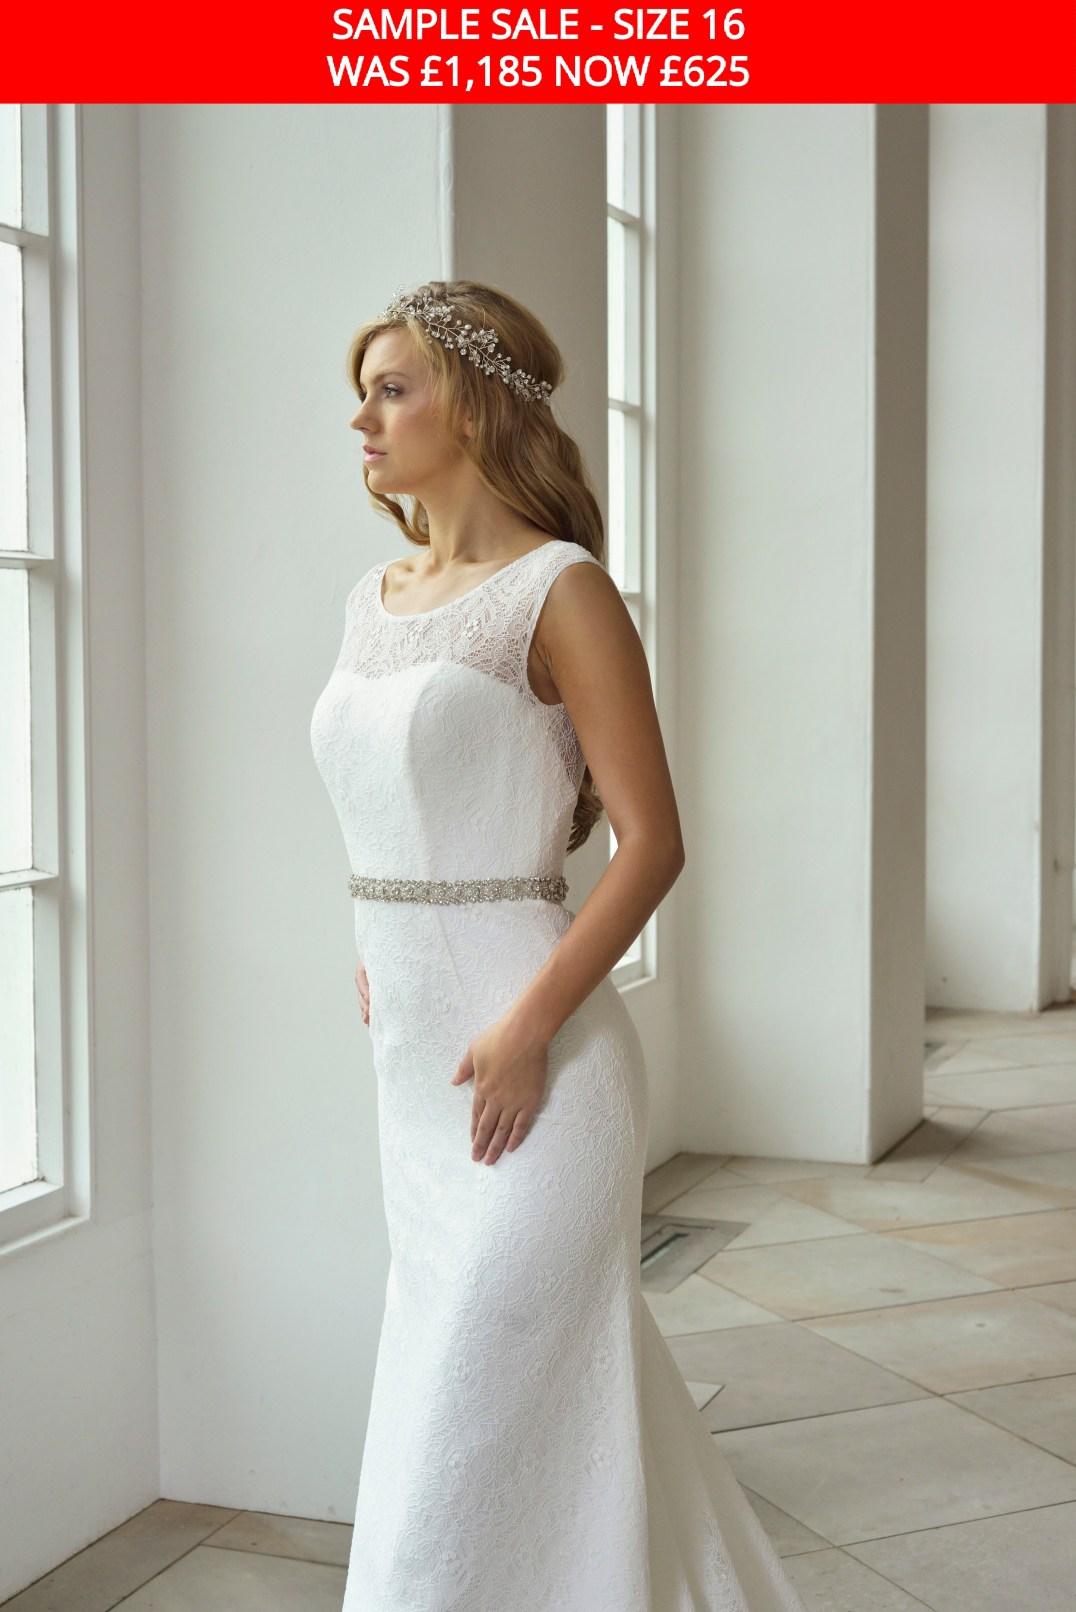 GAIA 1712 wedding dress sample sale